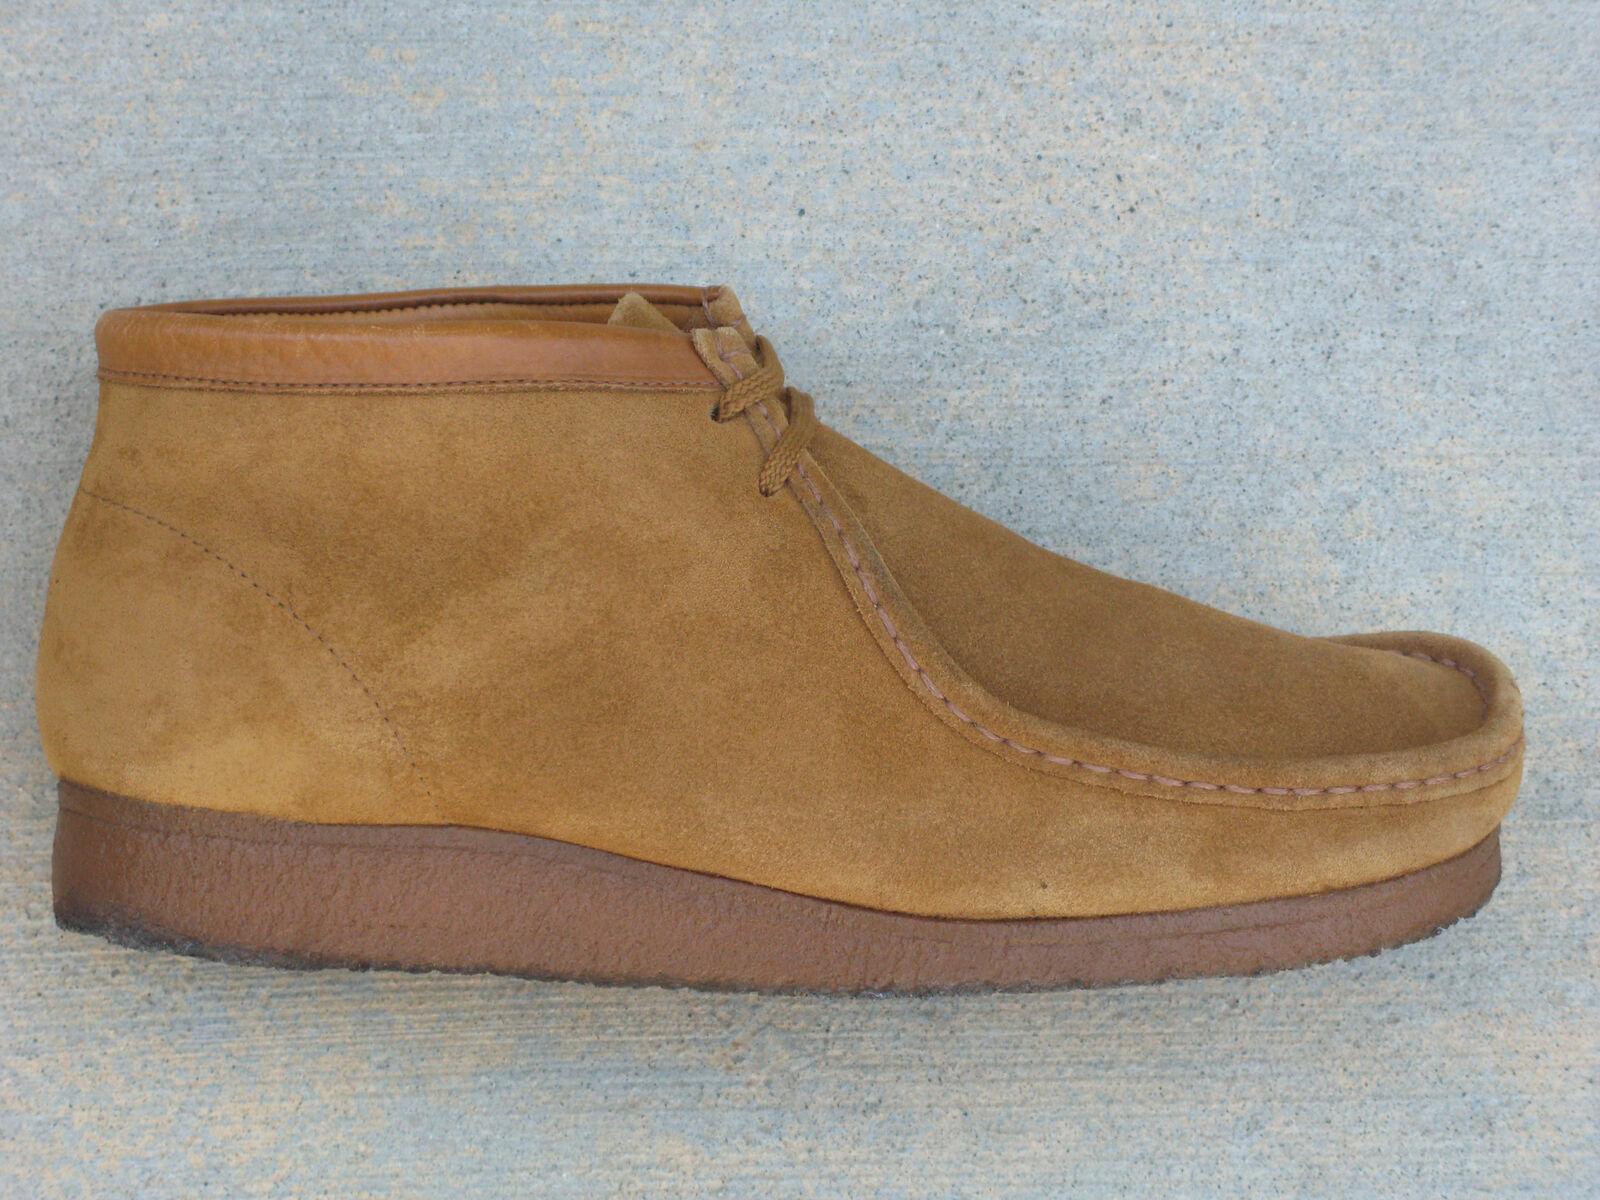 Clarks Original Wallabee Chukka Mid Boots Men Sz 13 M Tan Suede Leather